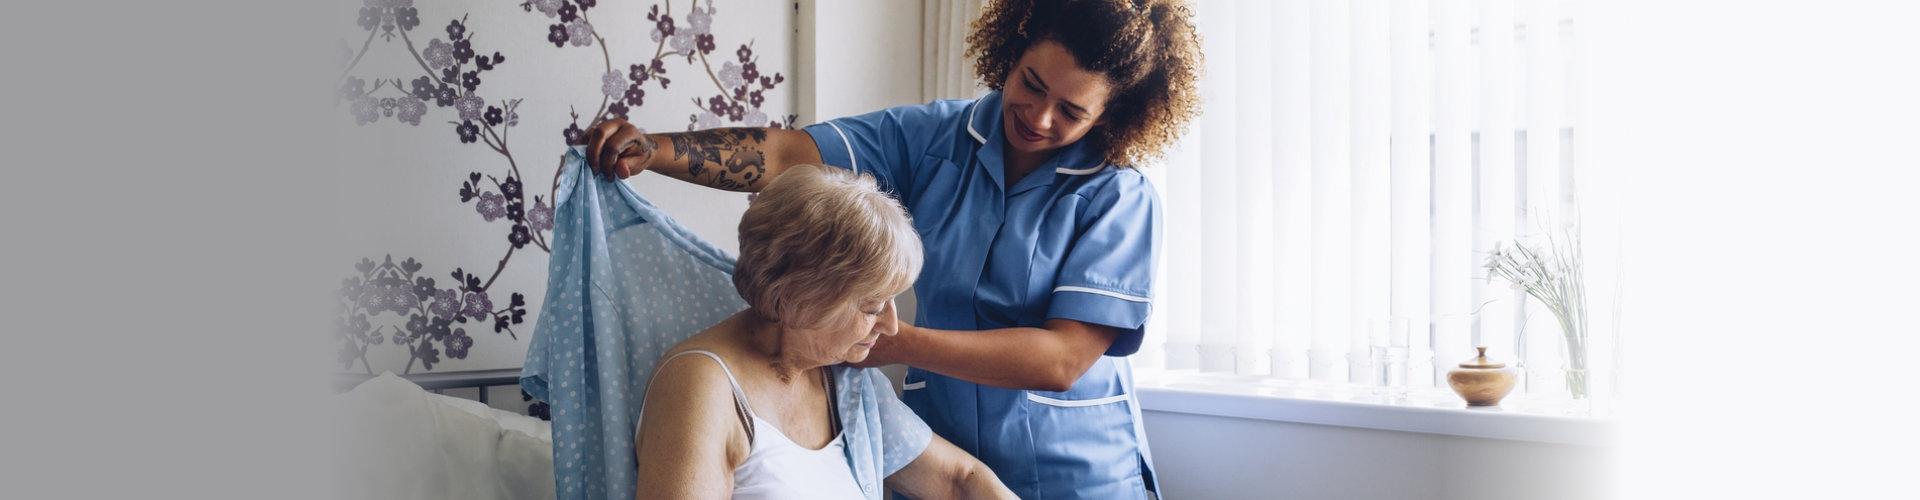 caregiver helping a senior woman get dressed